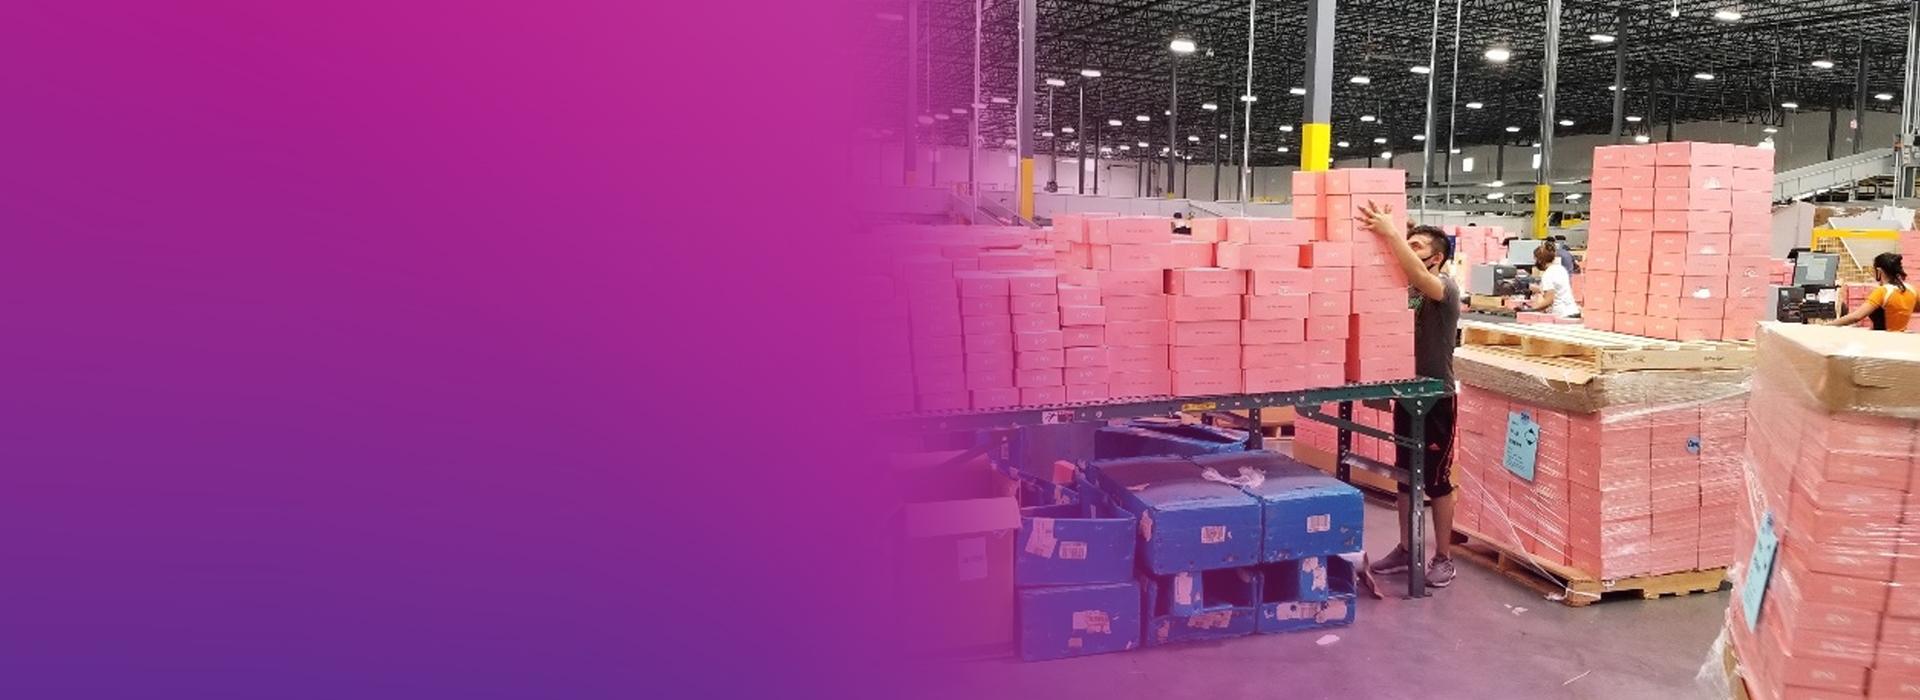 PB Warehouse